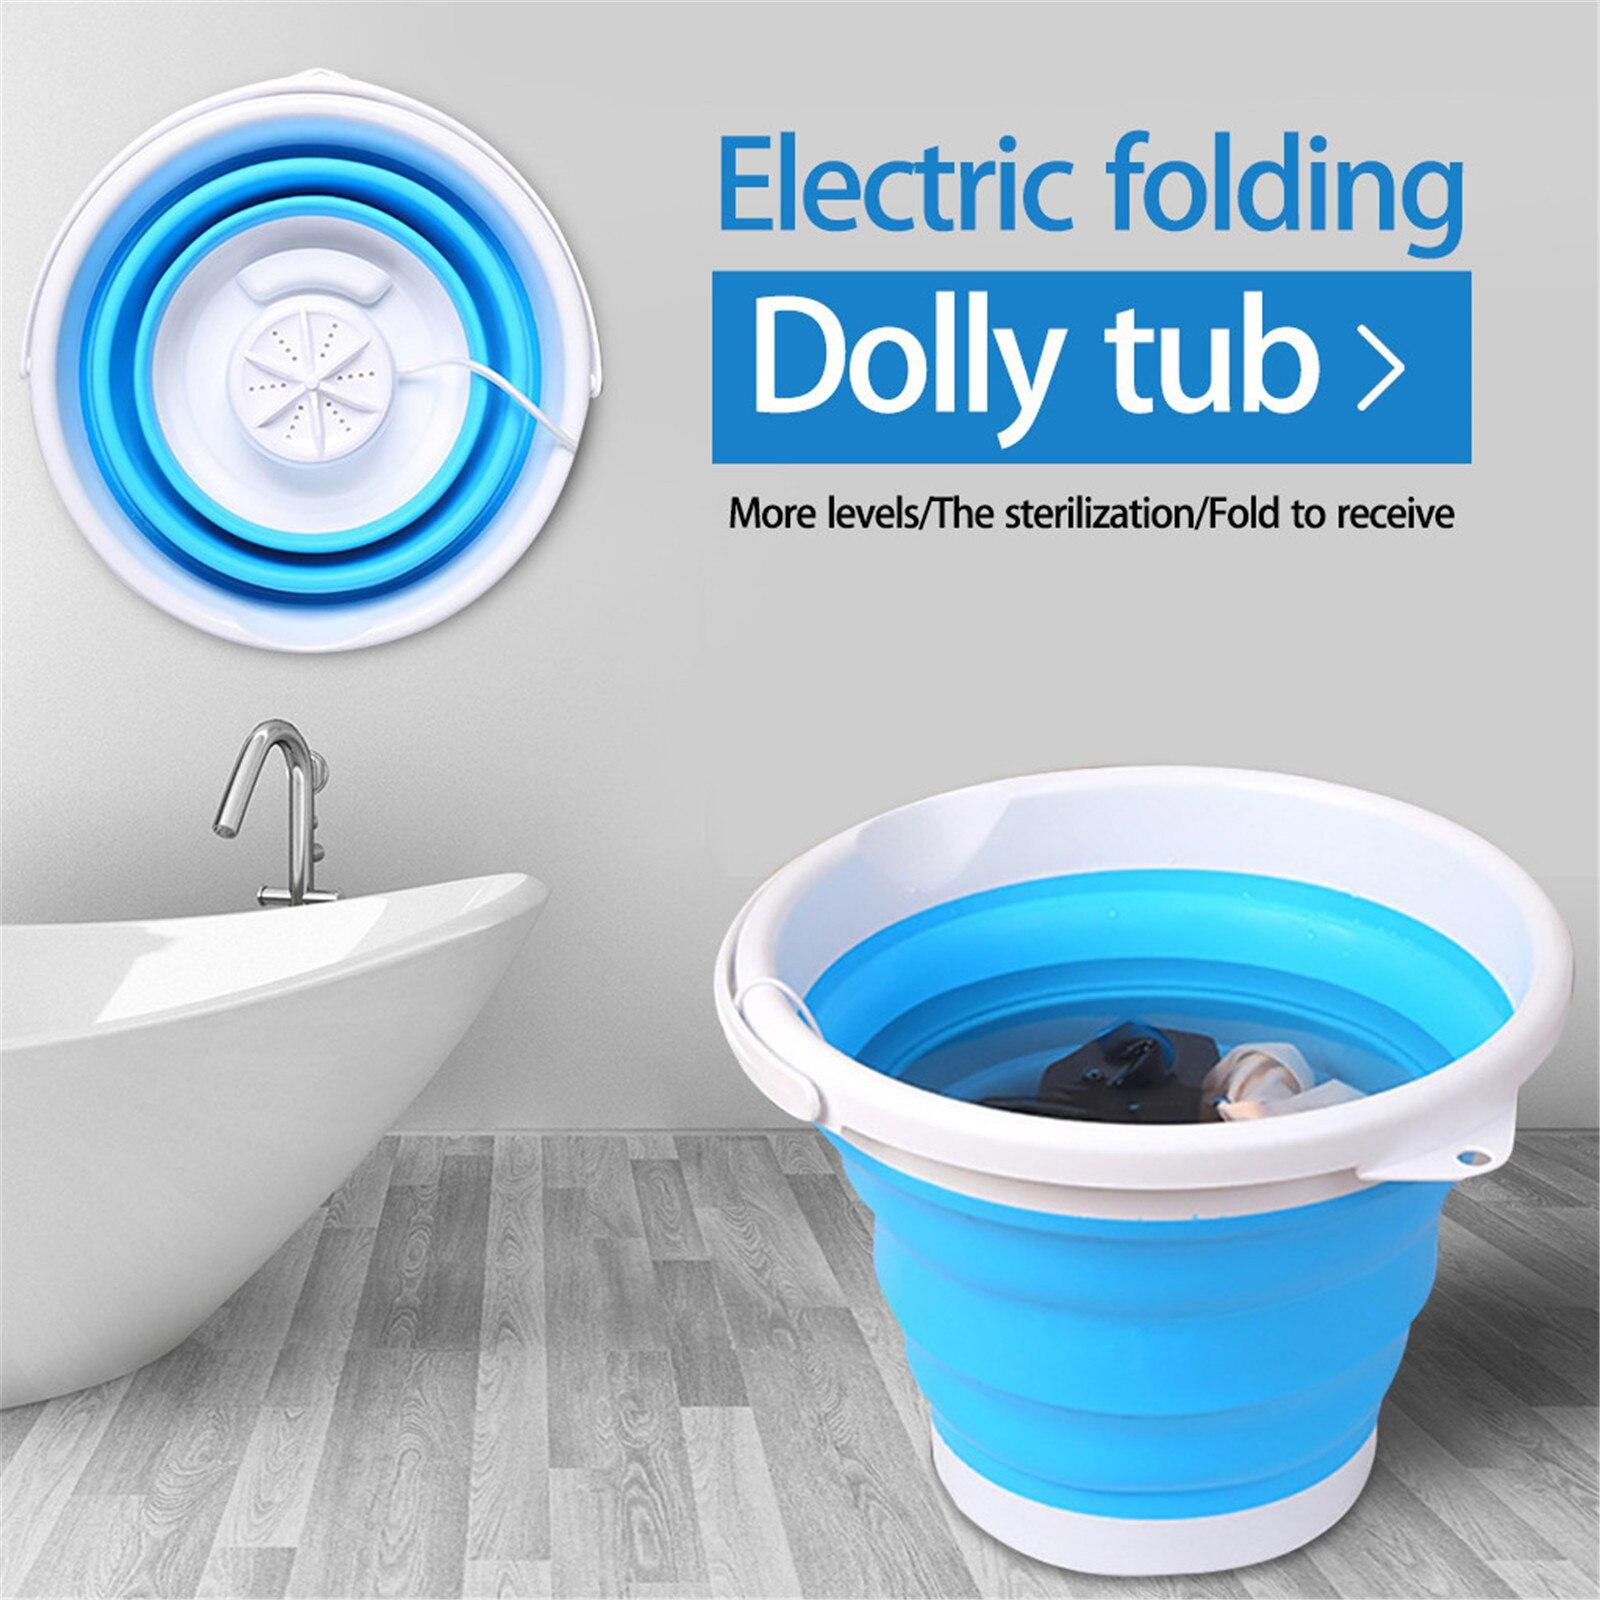 Multi-function Collapsible Wash Basin Camping Wash Basin Foot Basin Bathroom Accessory Dropshipping 2021 Hot